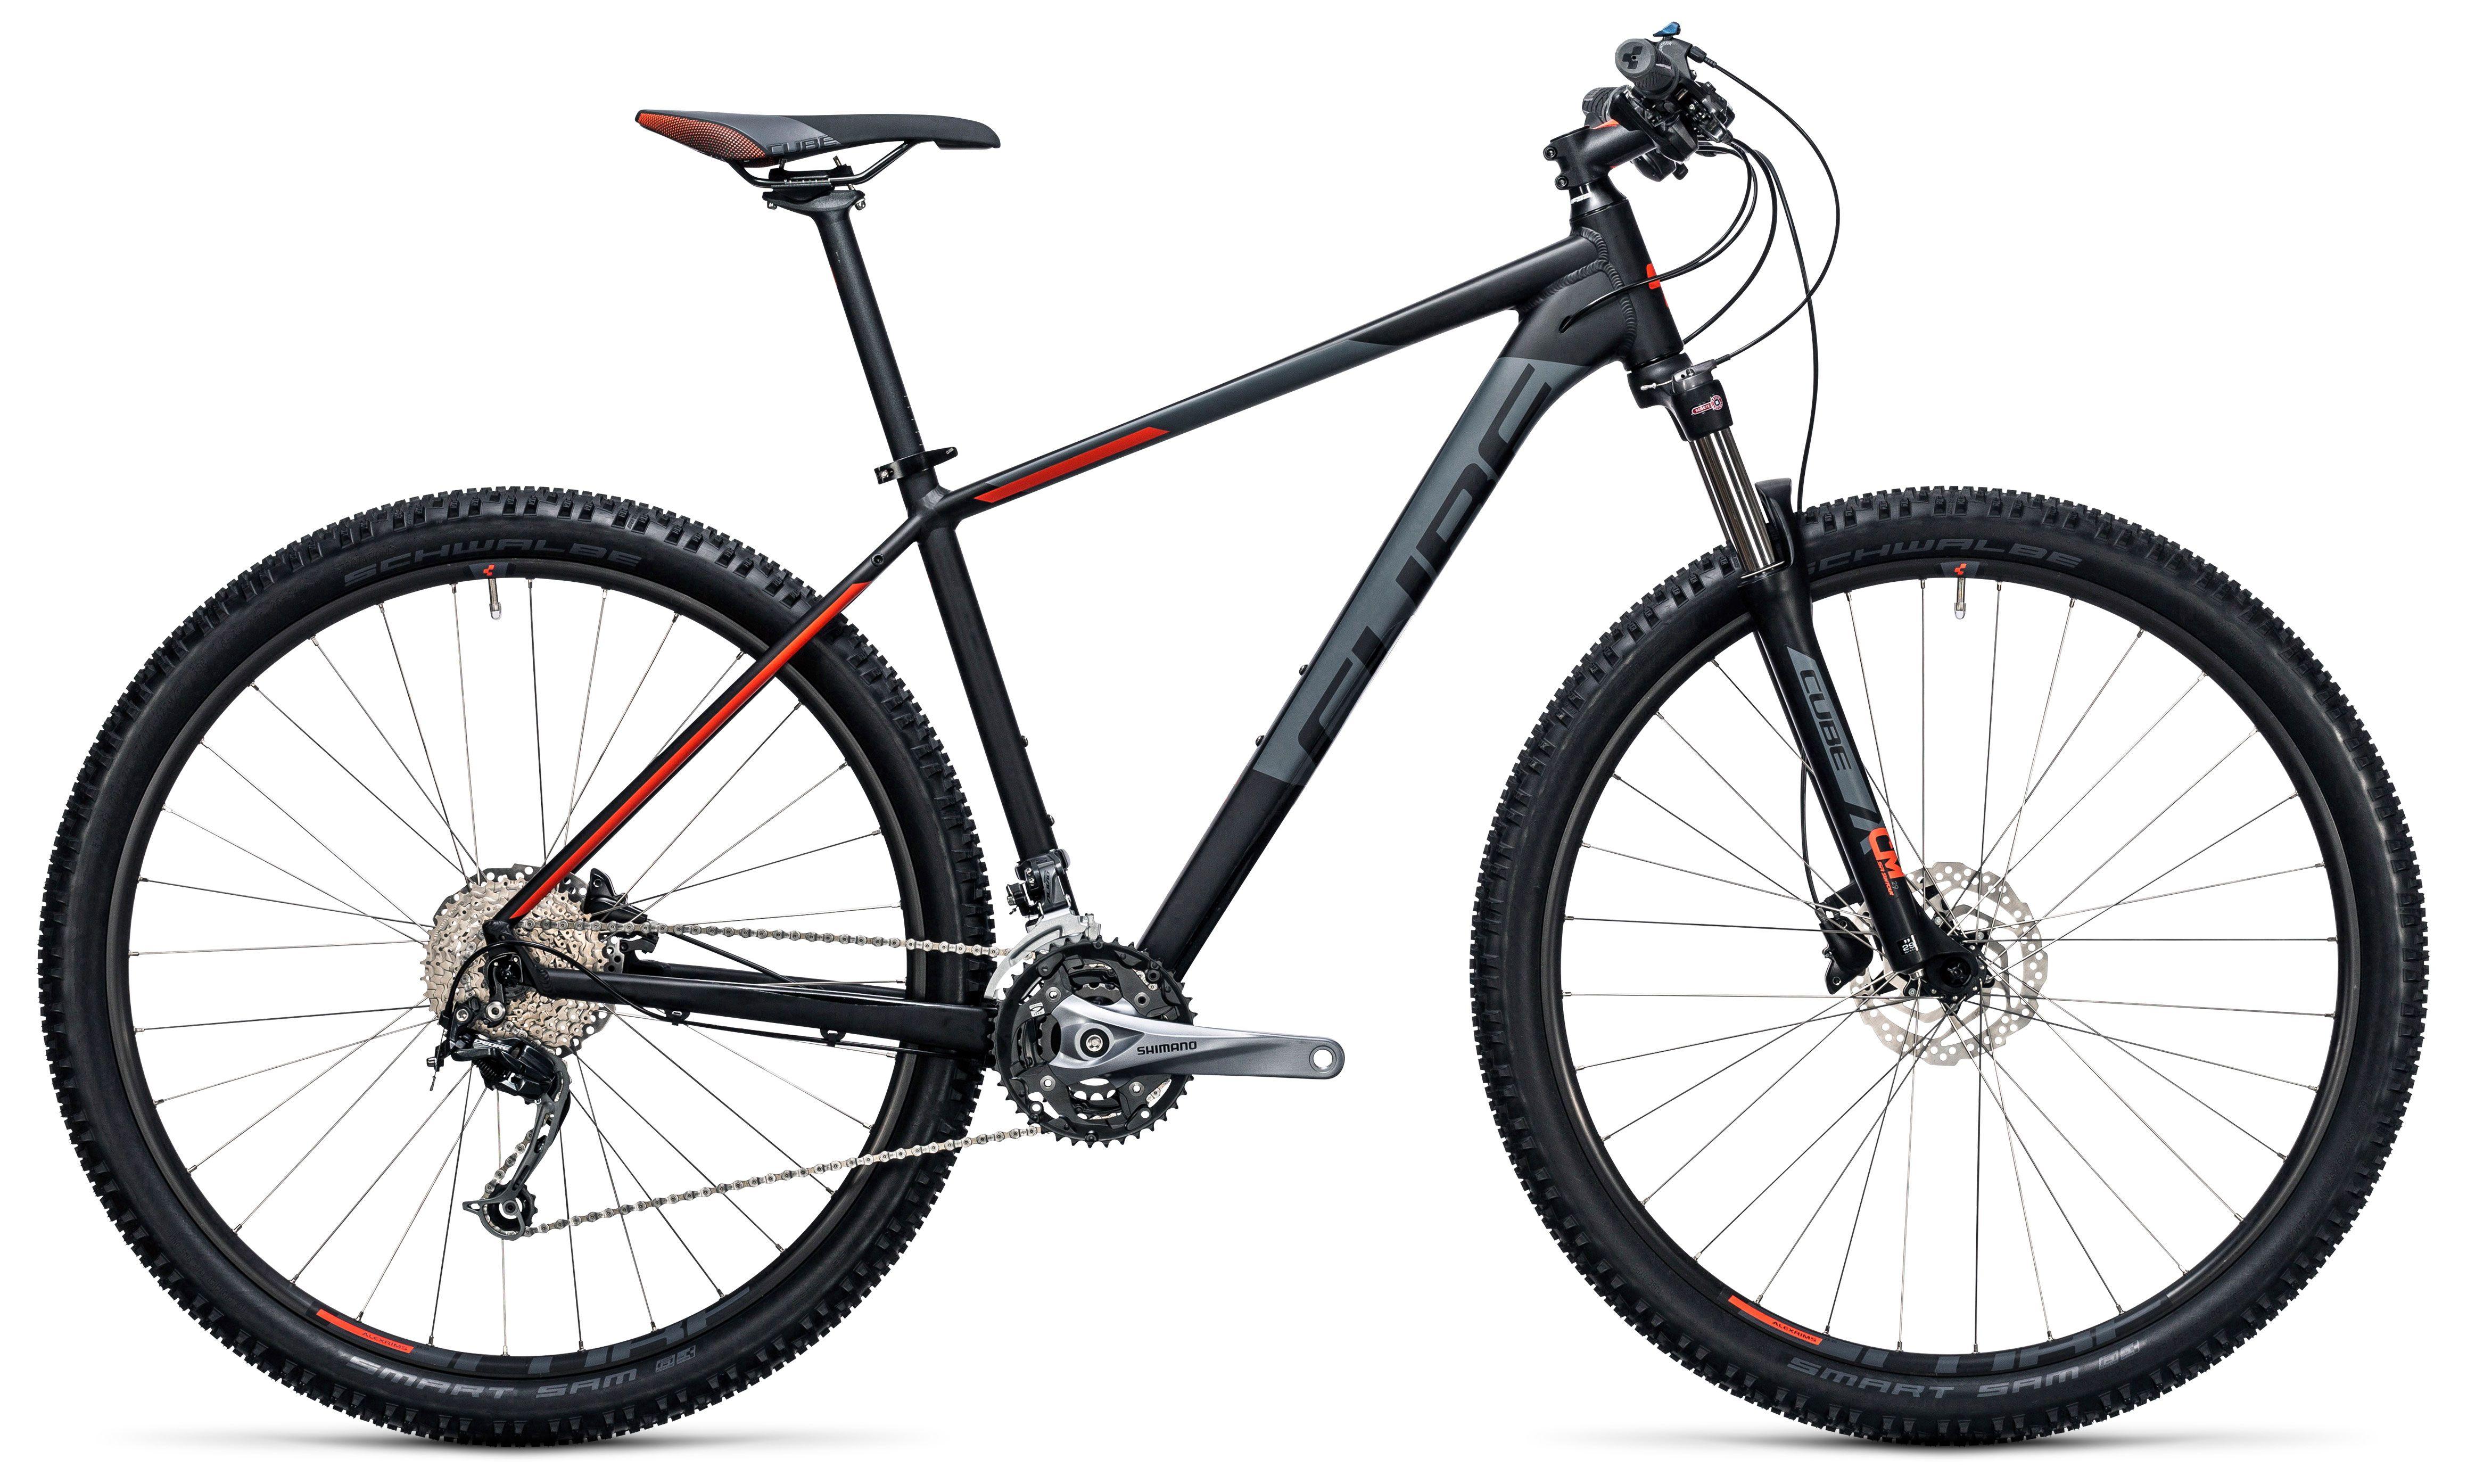 Велосипед Cube AIM SL 27.5 2017 велосипед cube aim sl 27 5 2016